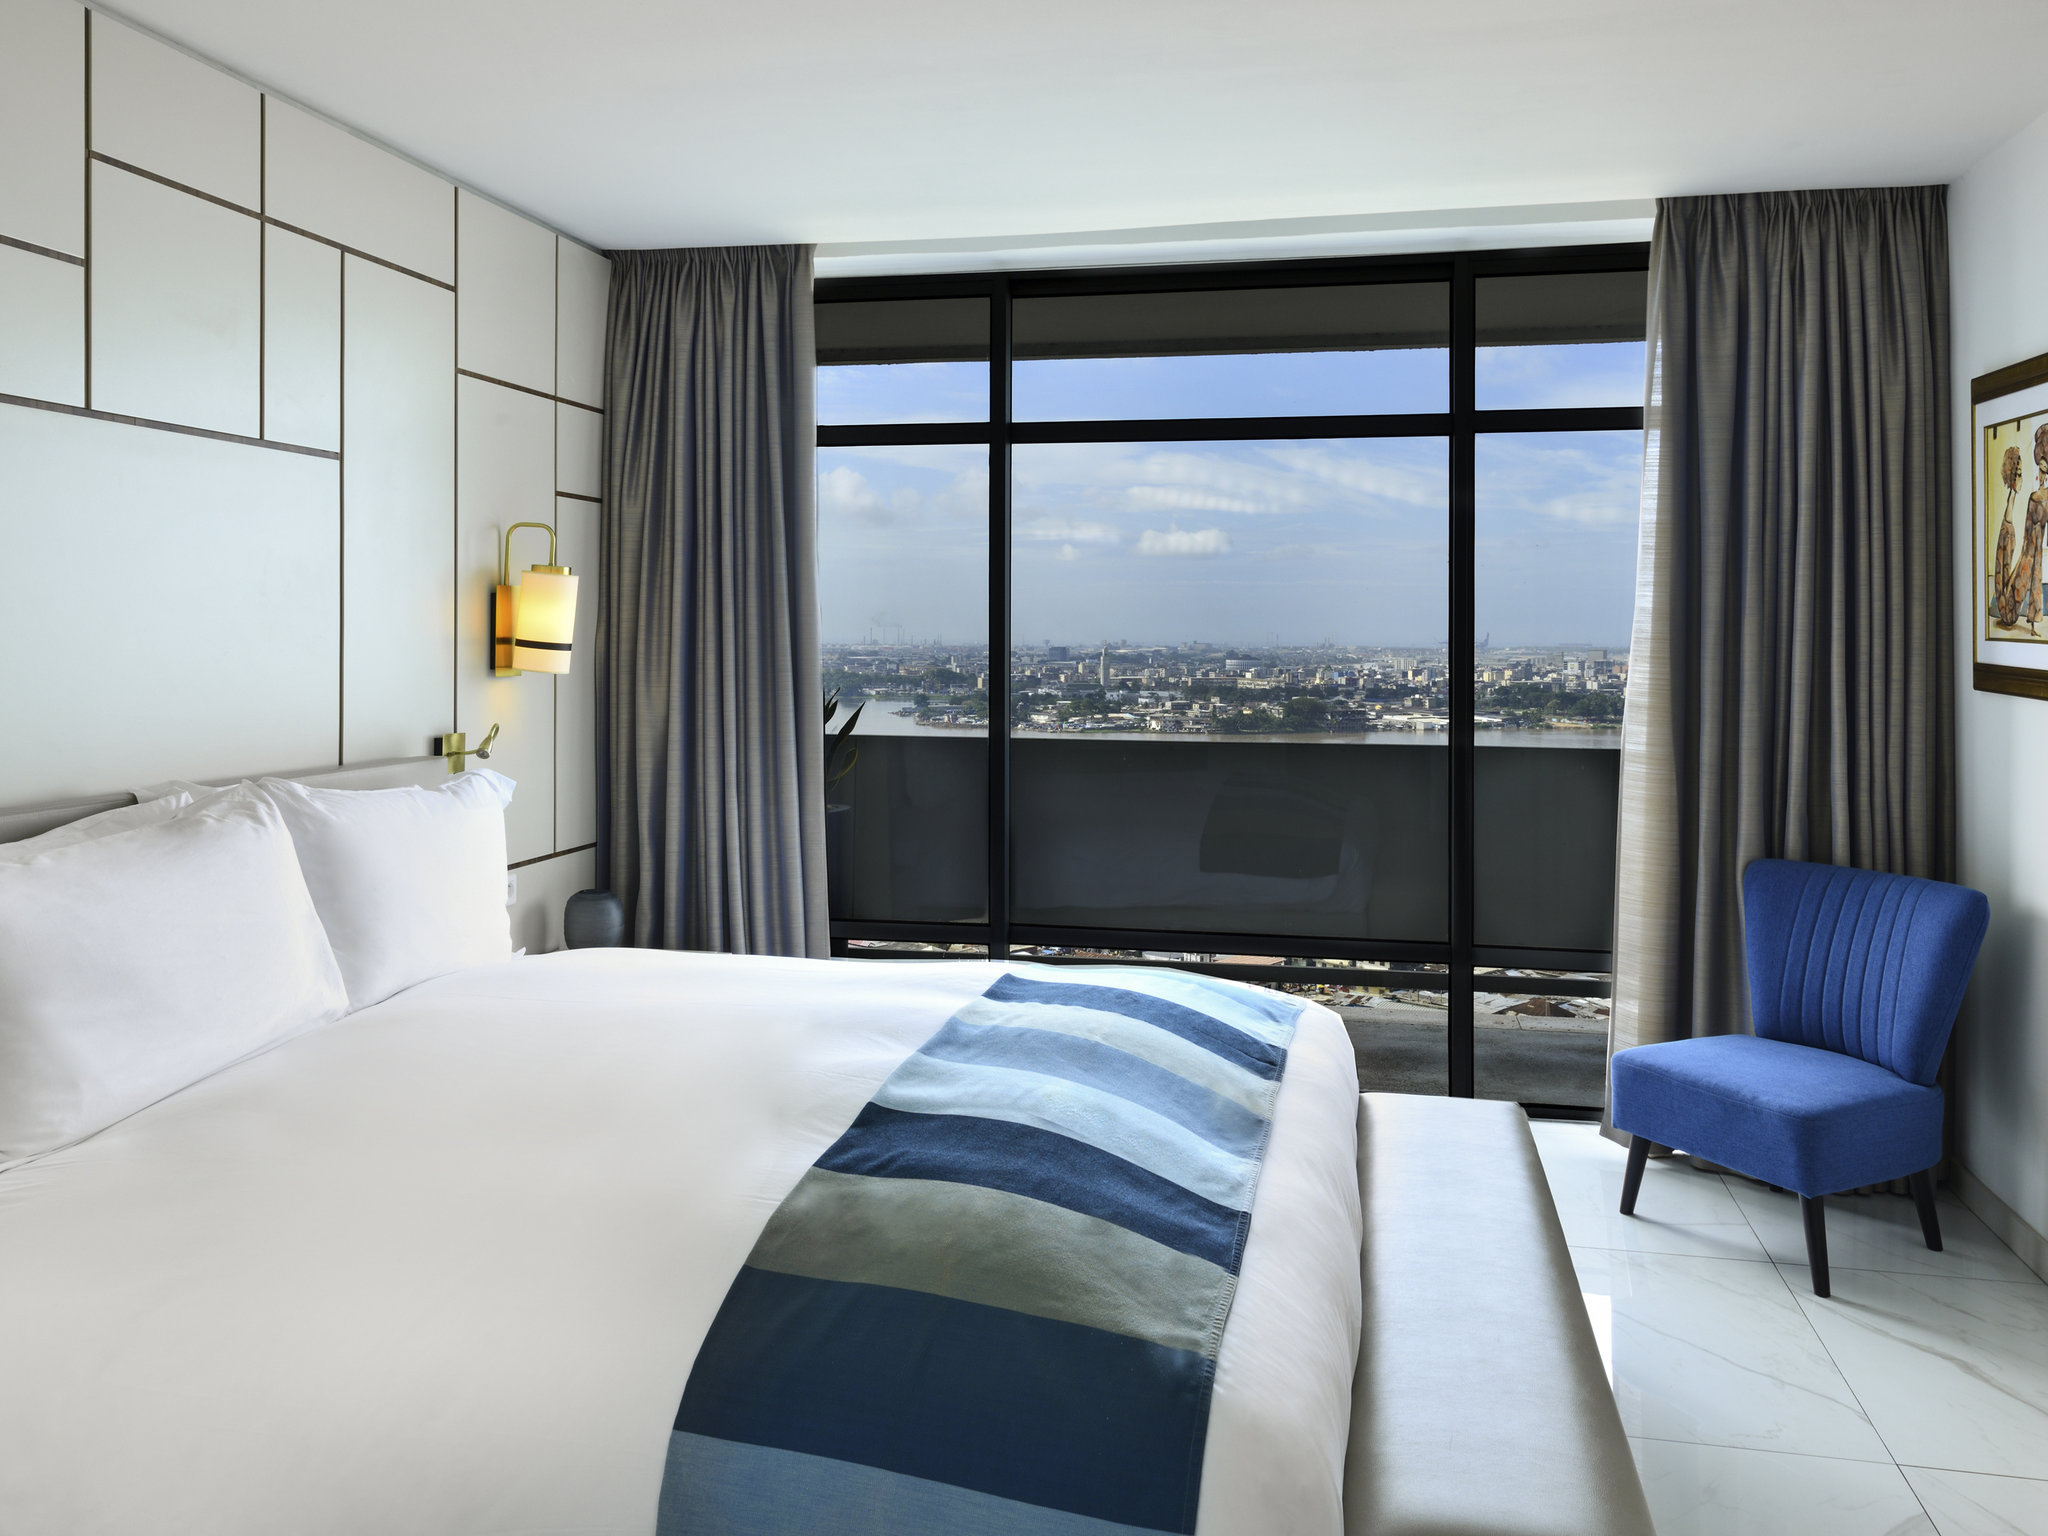 Otel – Sofitel Abidjan Hôtel Ivoire